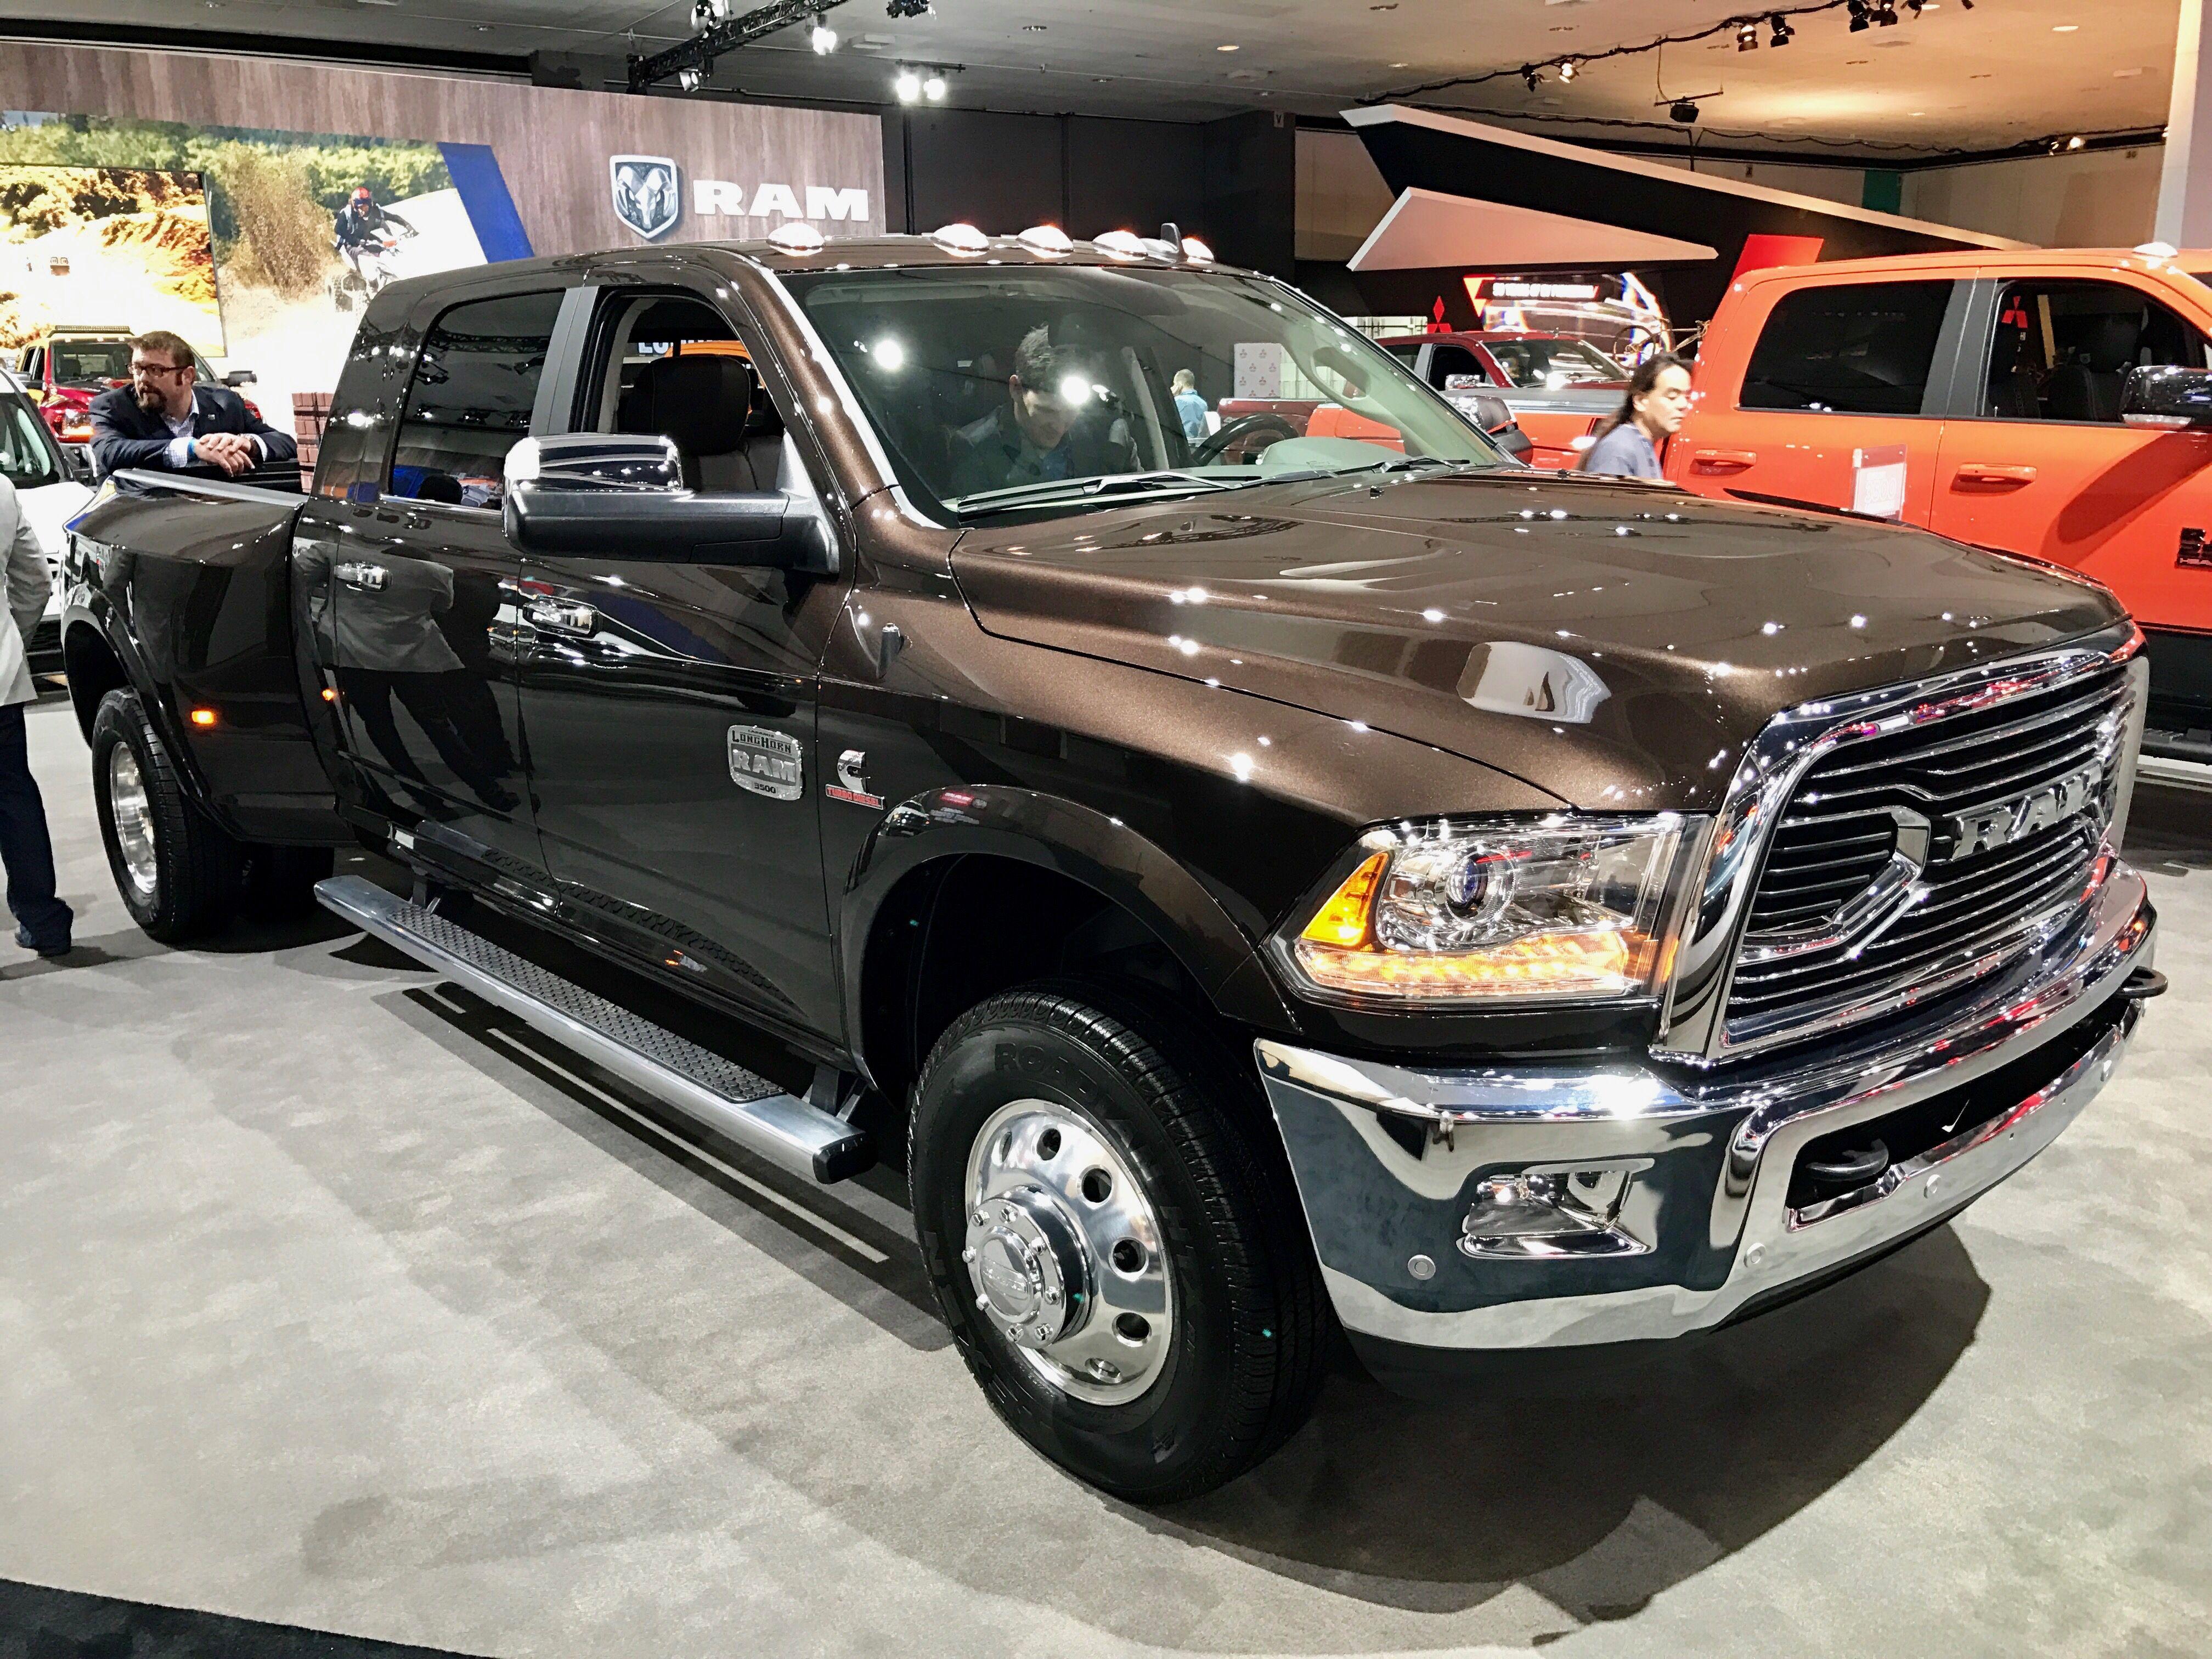 2017 ram 3500 longhorn 6 7l cummins diesel laautoshow trucks laramie trucks pinterest. Black Bedroom Furniture Sets. Home Design Ideas